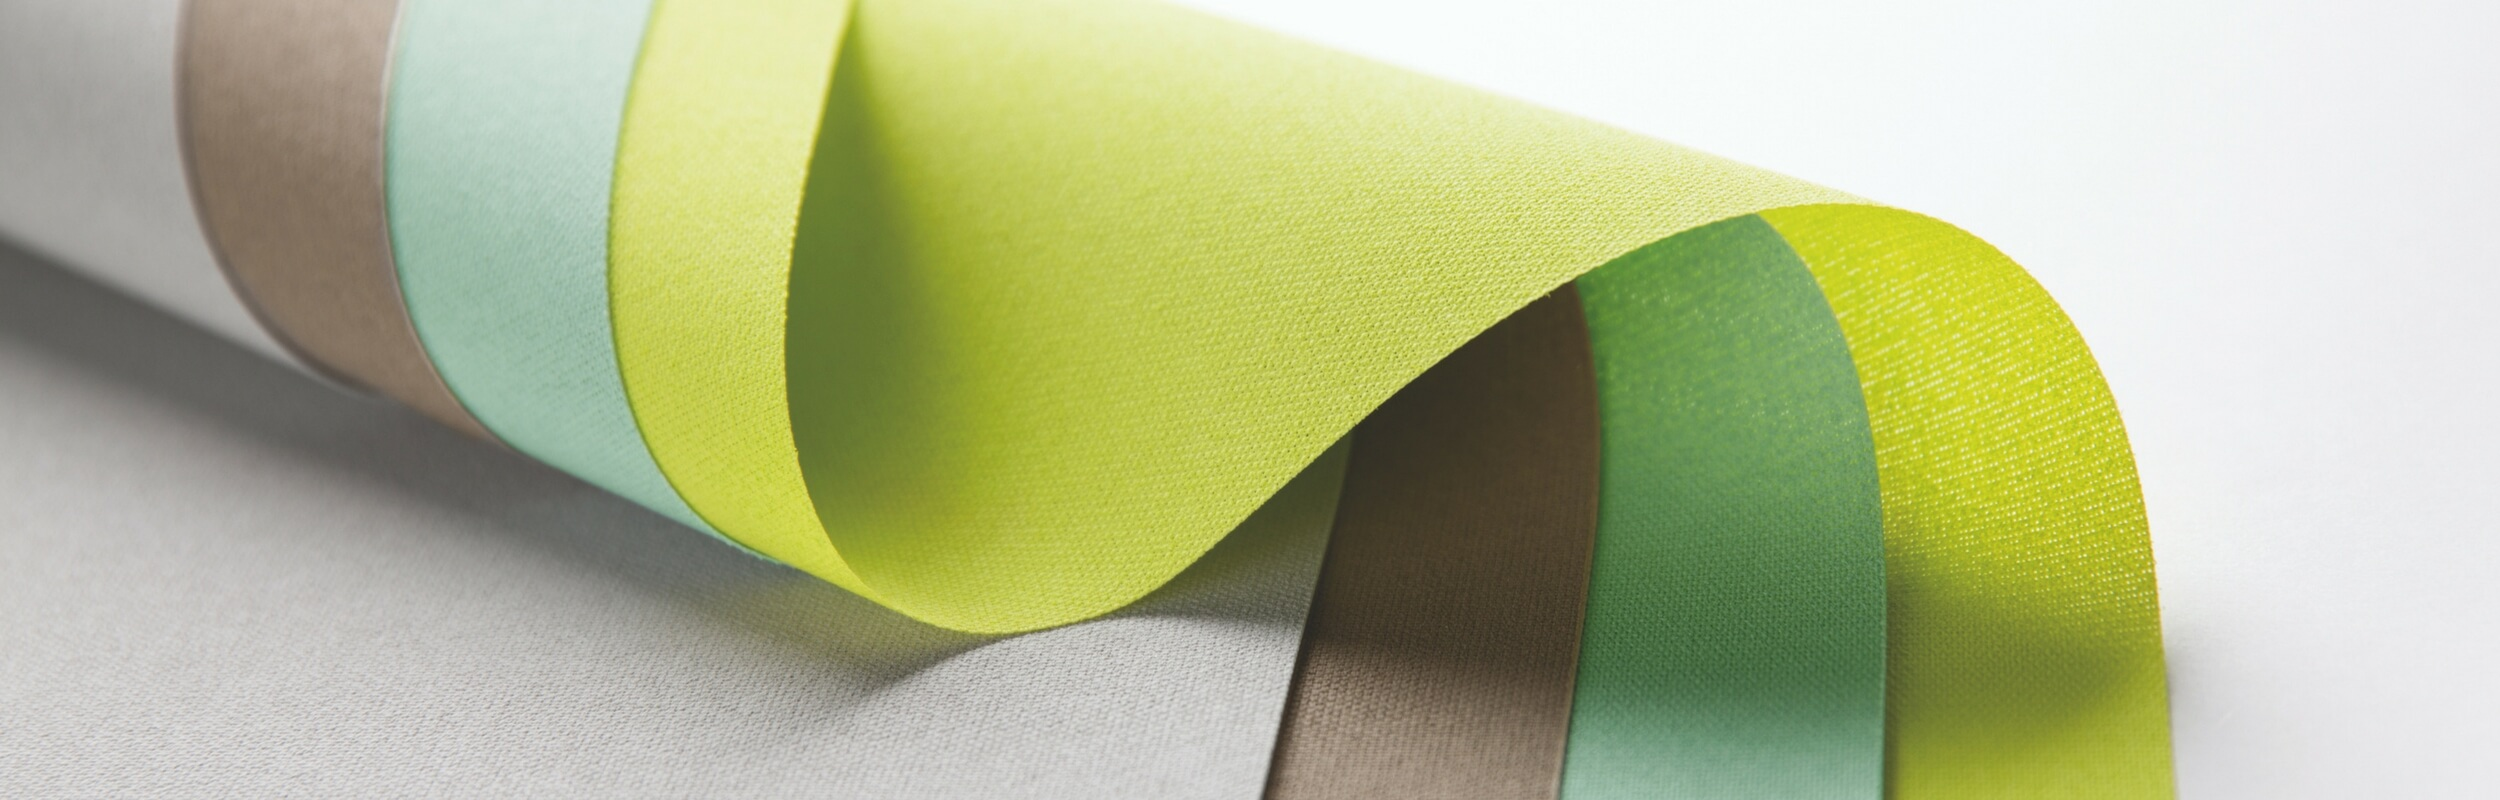 Choosing Fabric for Performance